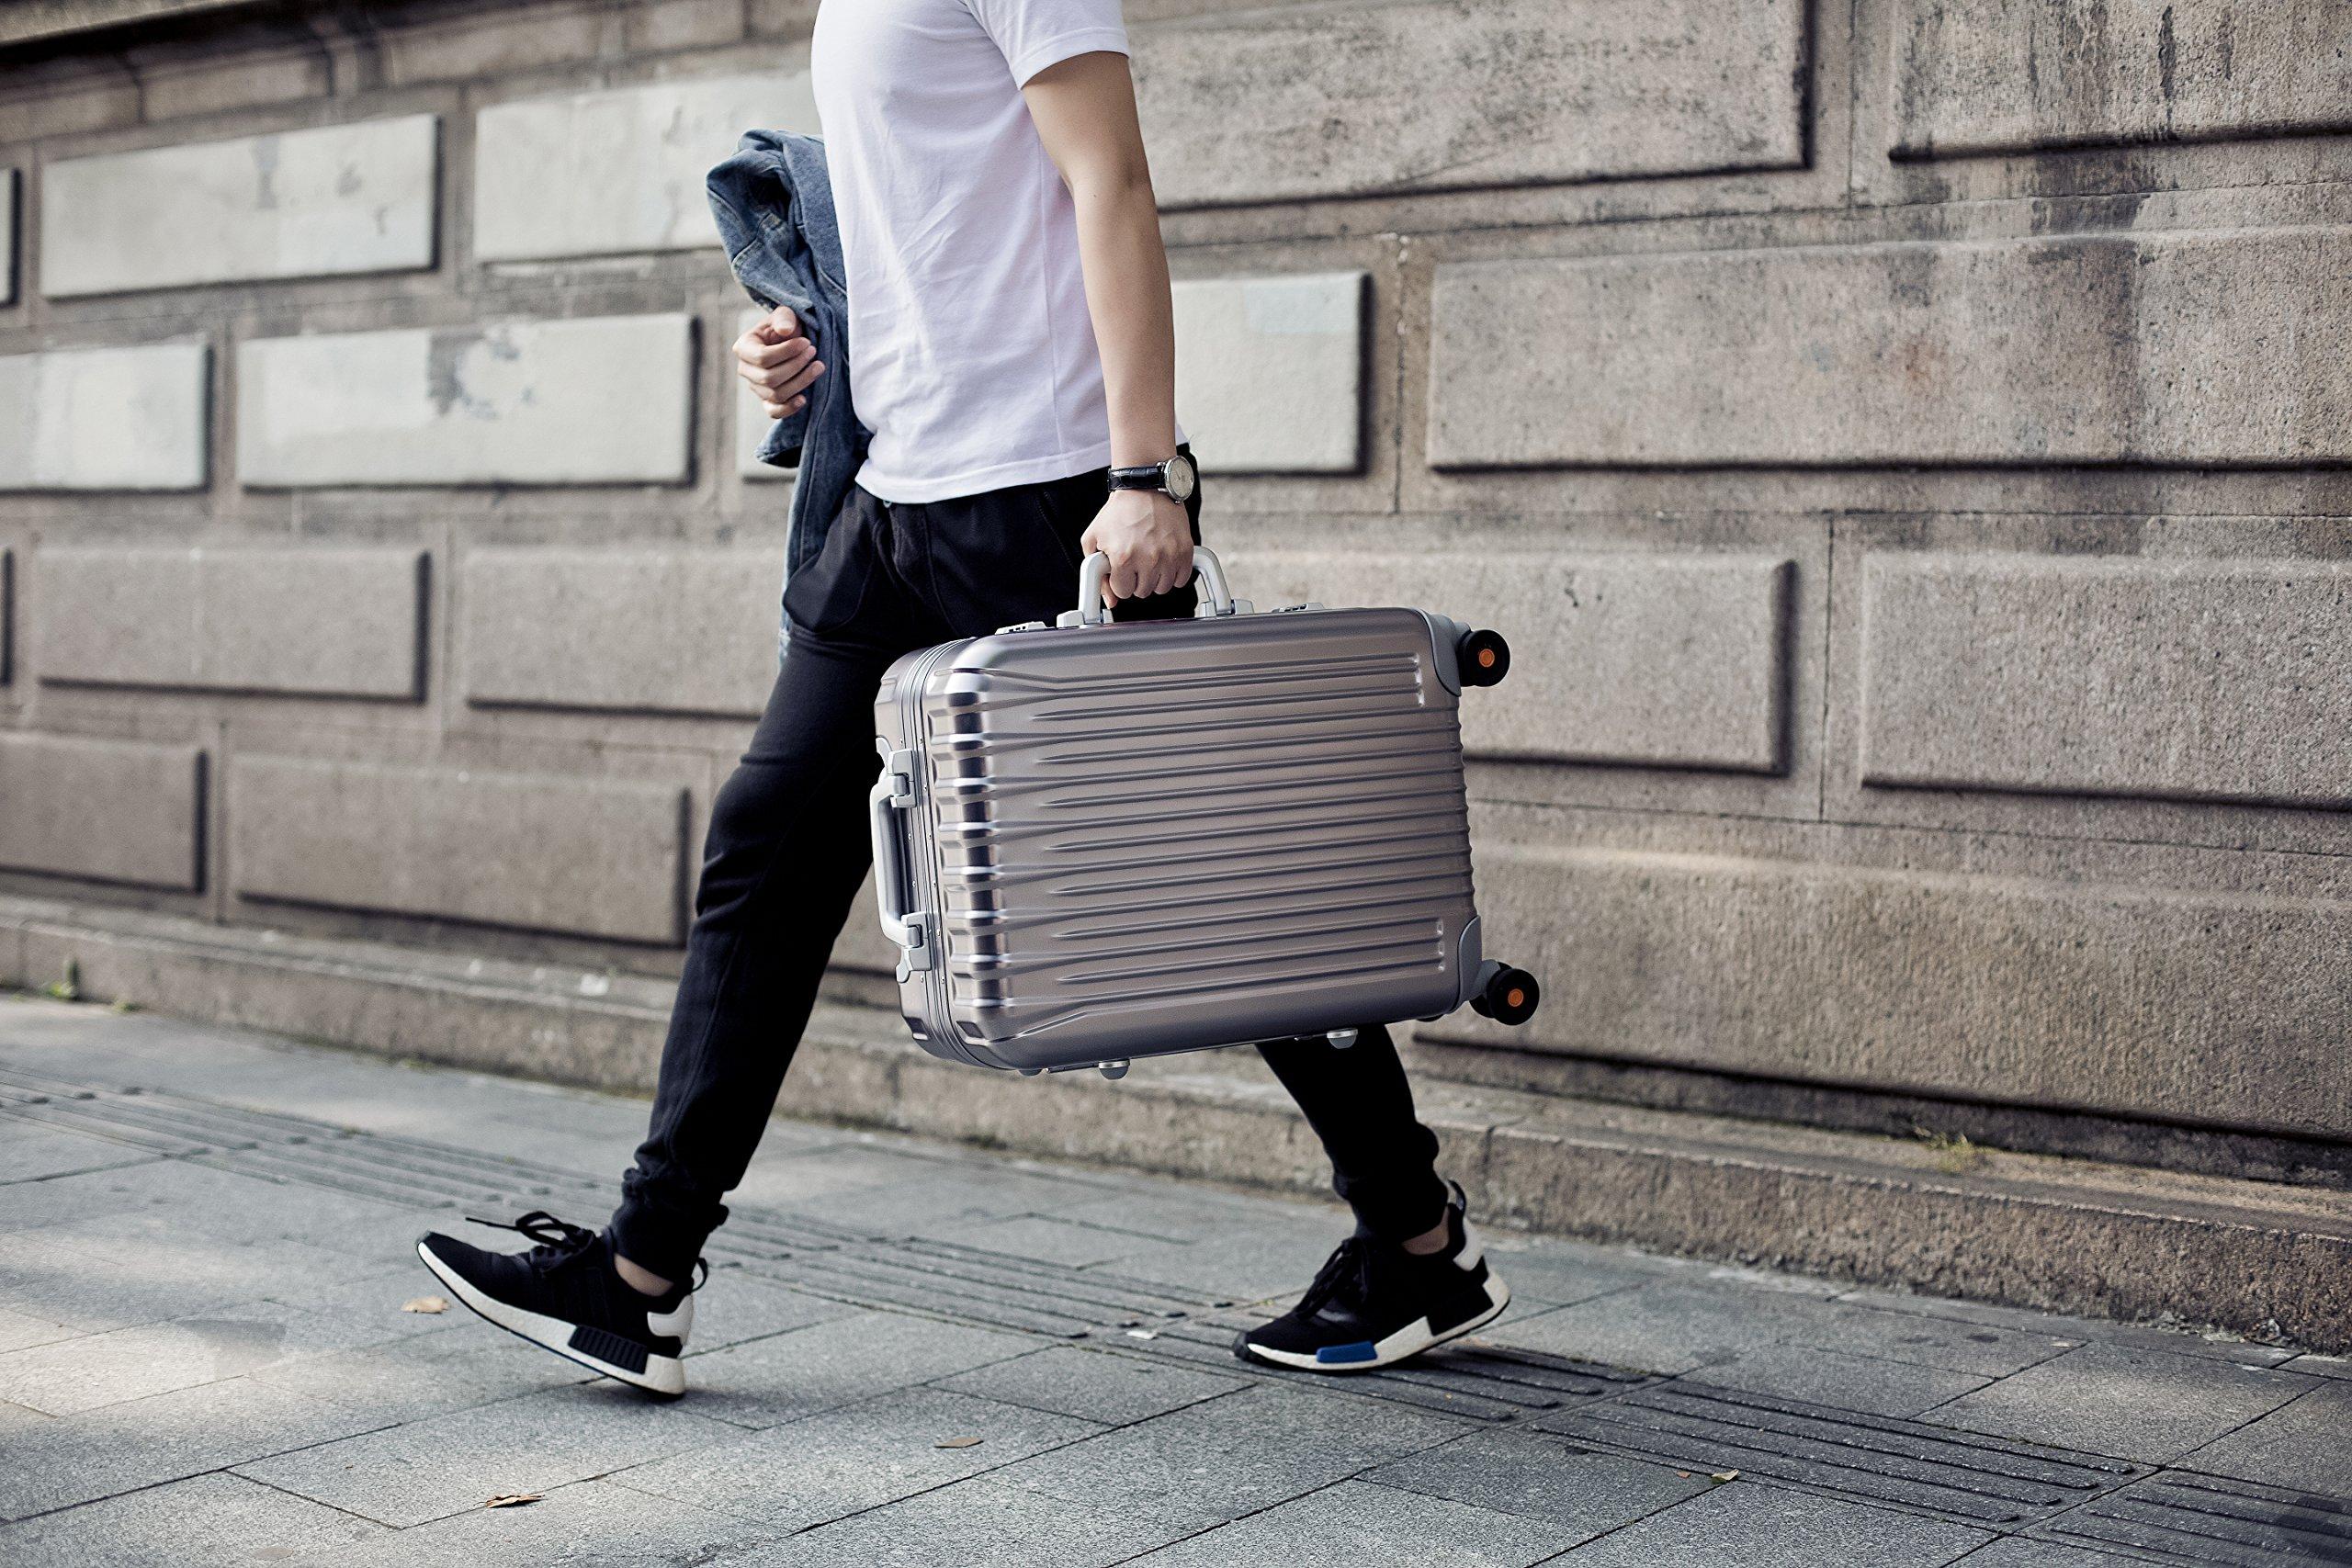 All Aluminum Luggage, HardShell Carry On Spinner Suitcase Grade 5 Aluminum-Magnesium Alloy TSA Approved 20'', Gunmetal by Clothink (Image #7)